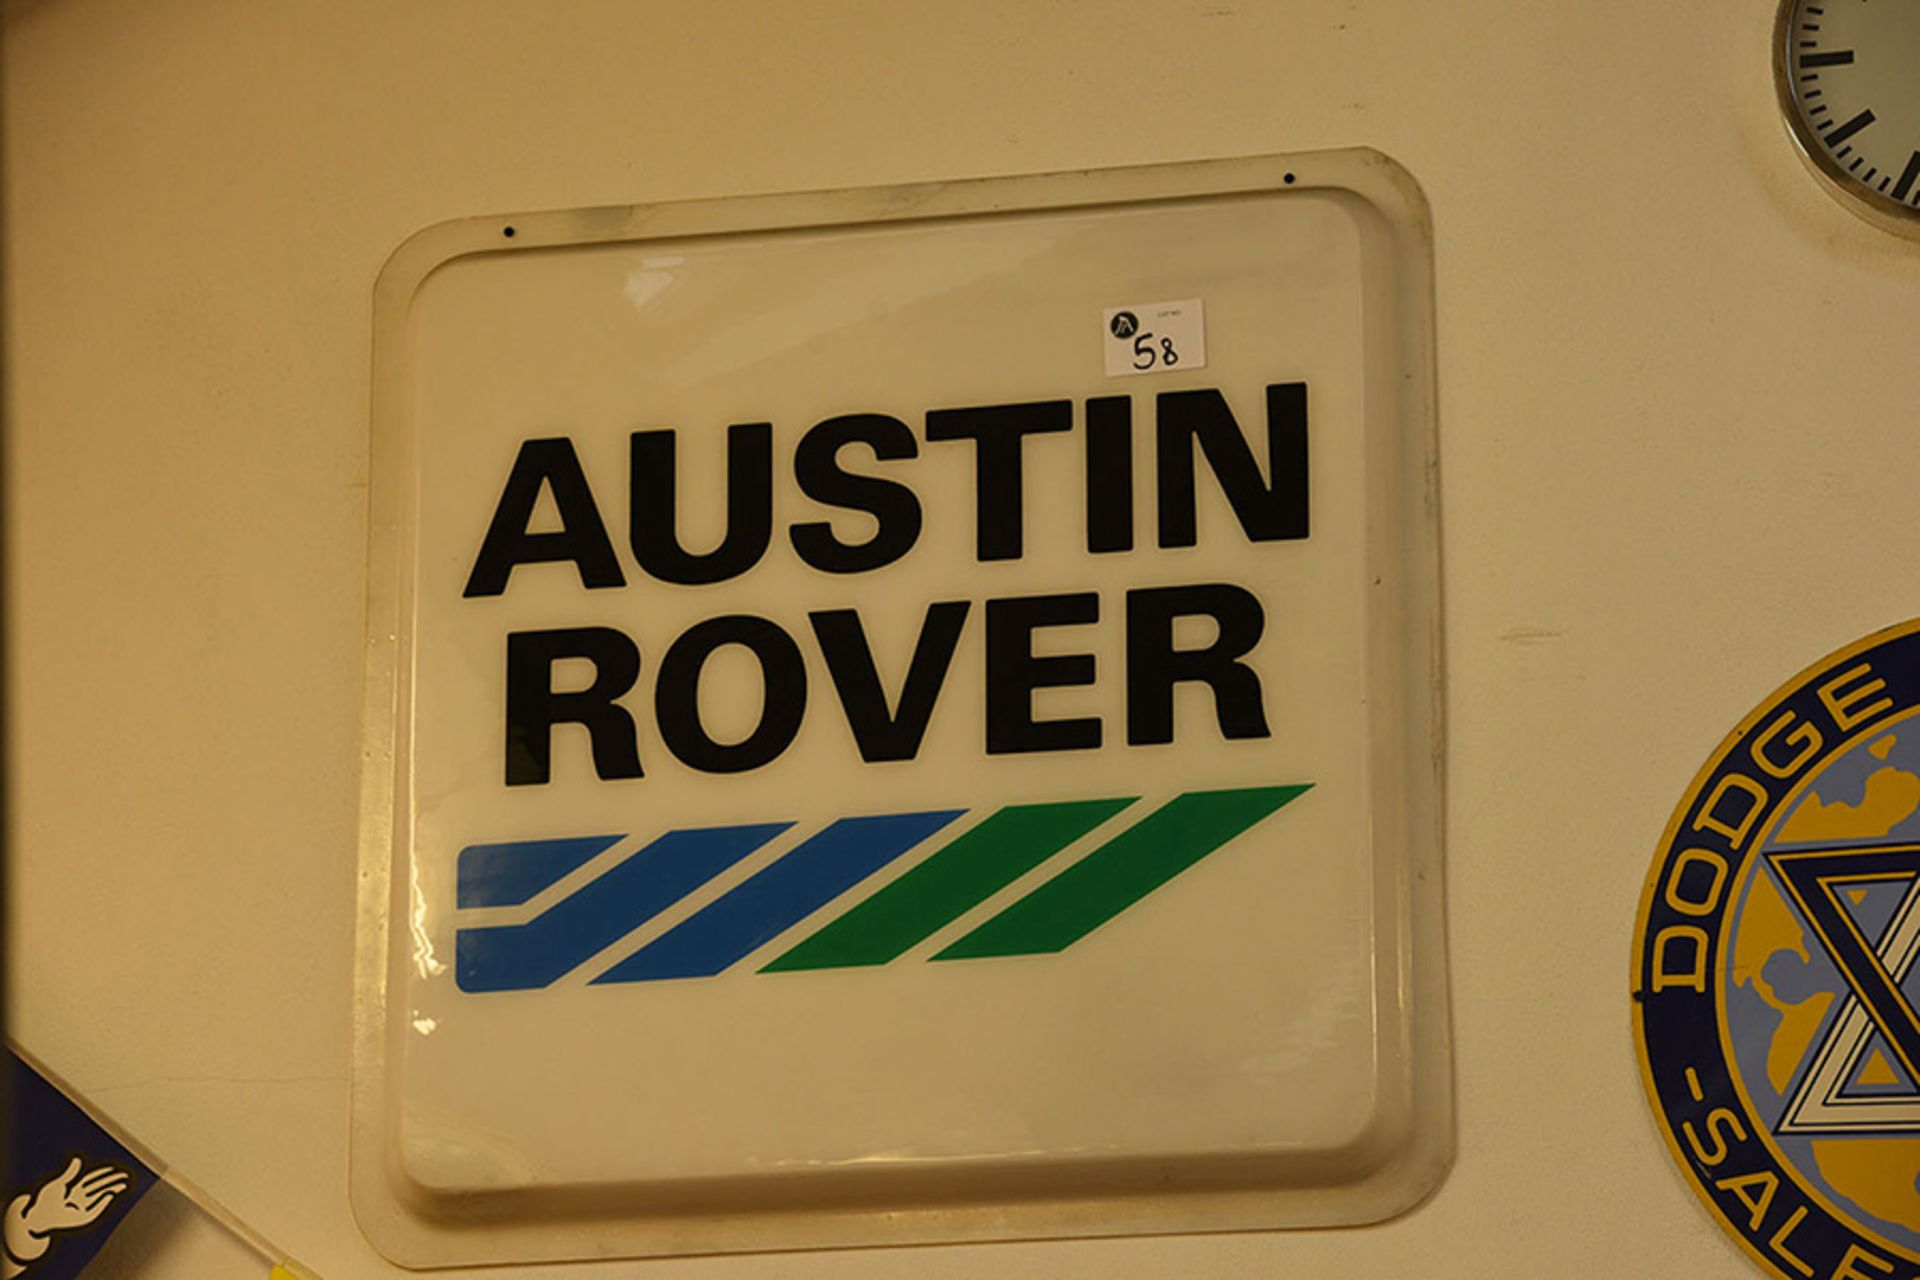 Lot 58 - Austin Rover Plastic Sign